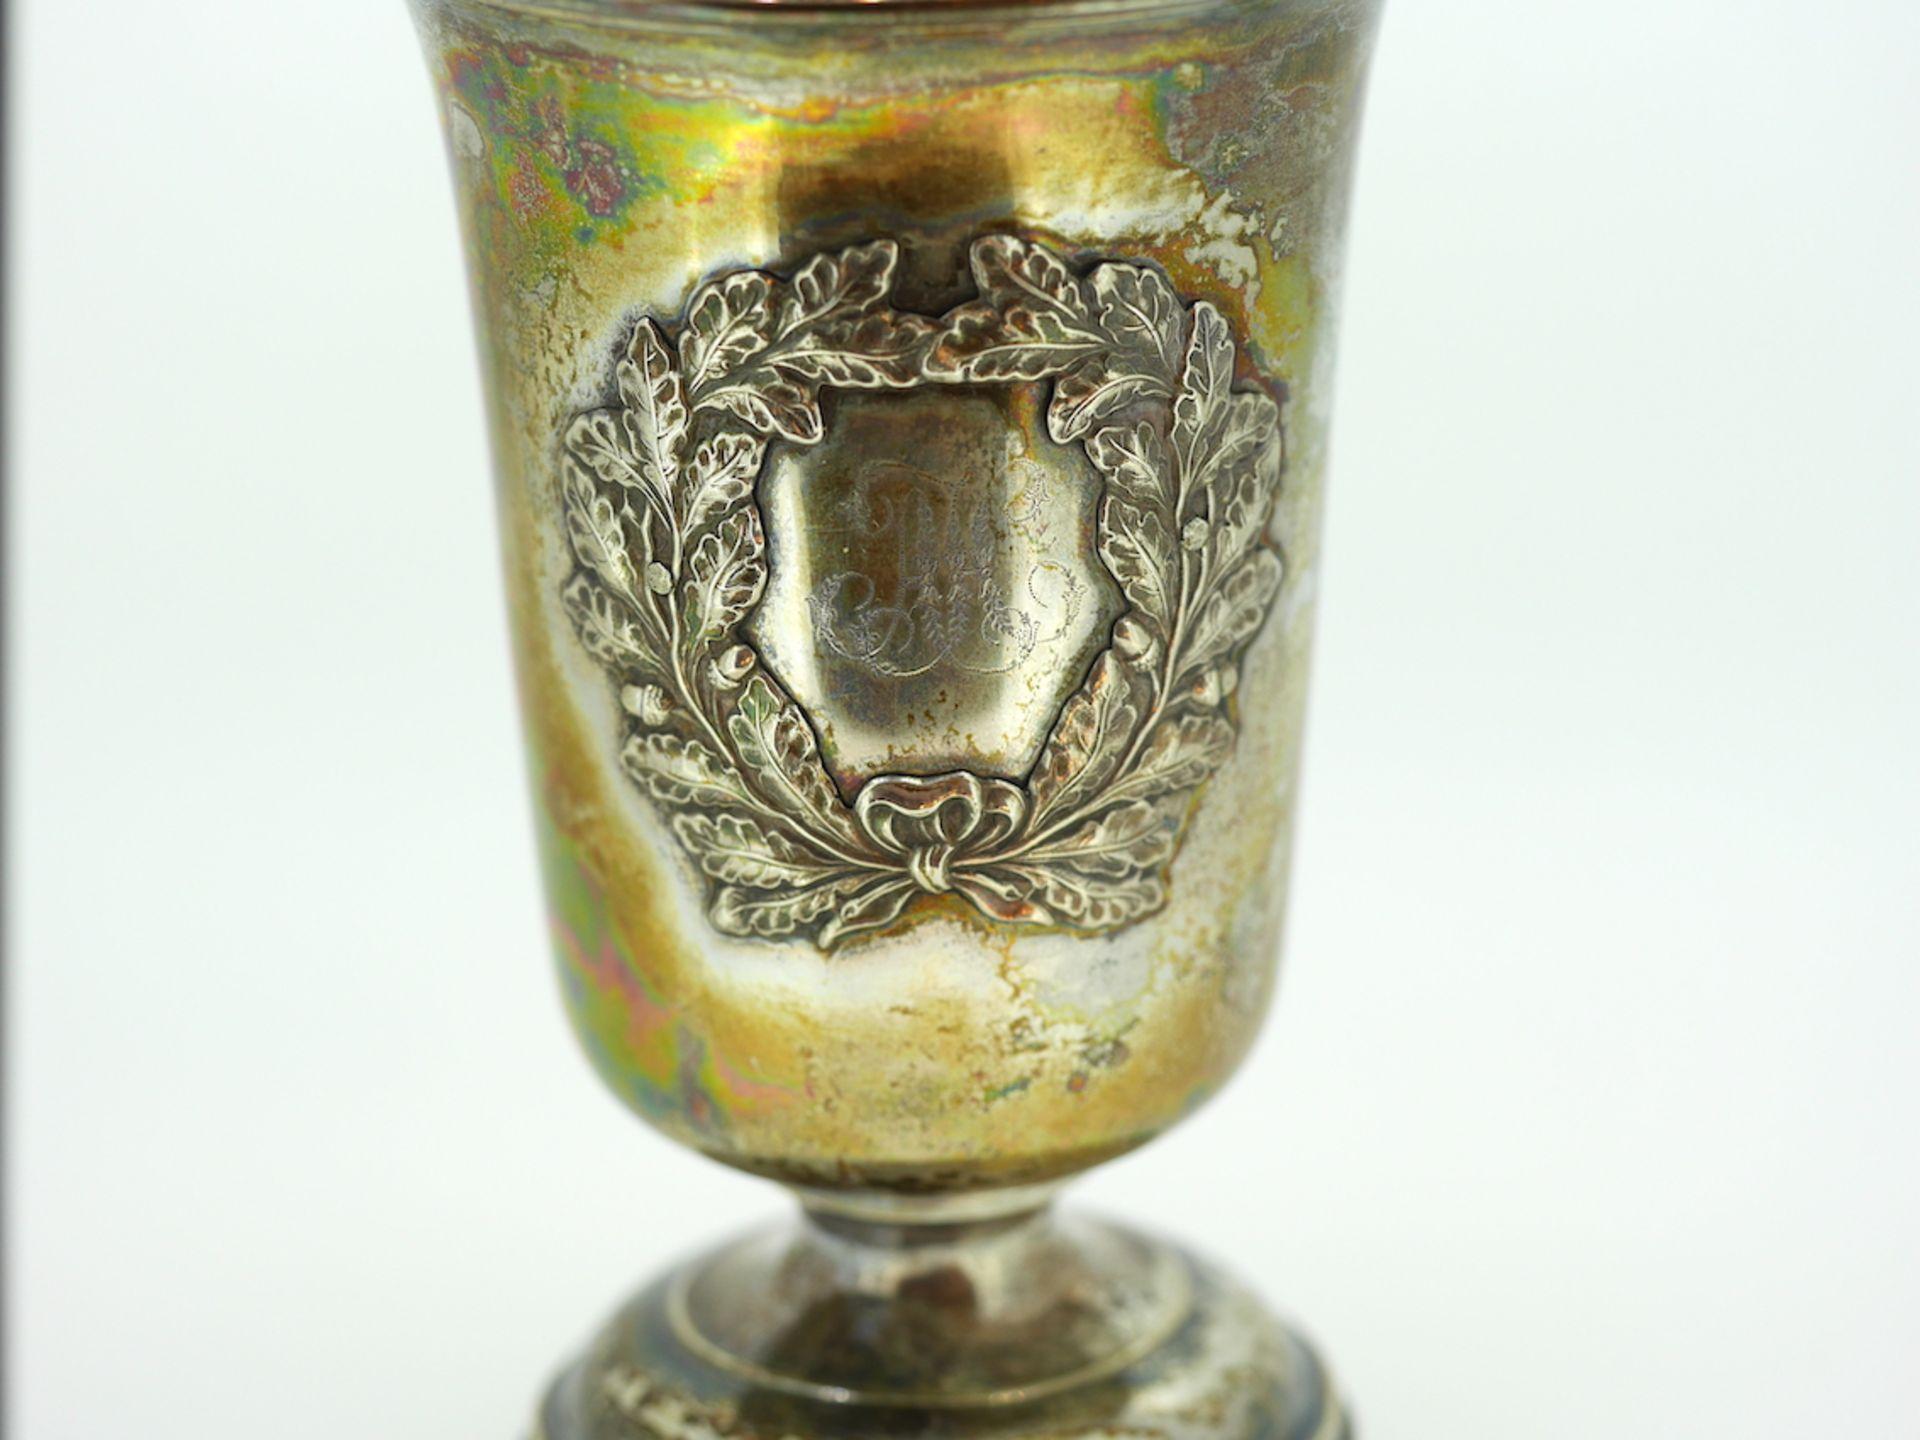 Becher aus 13 lötigem Silber, 12 cm hoch, Gewicht 96 Gramm